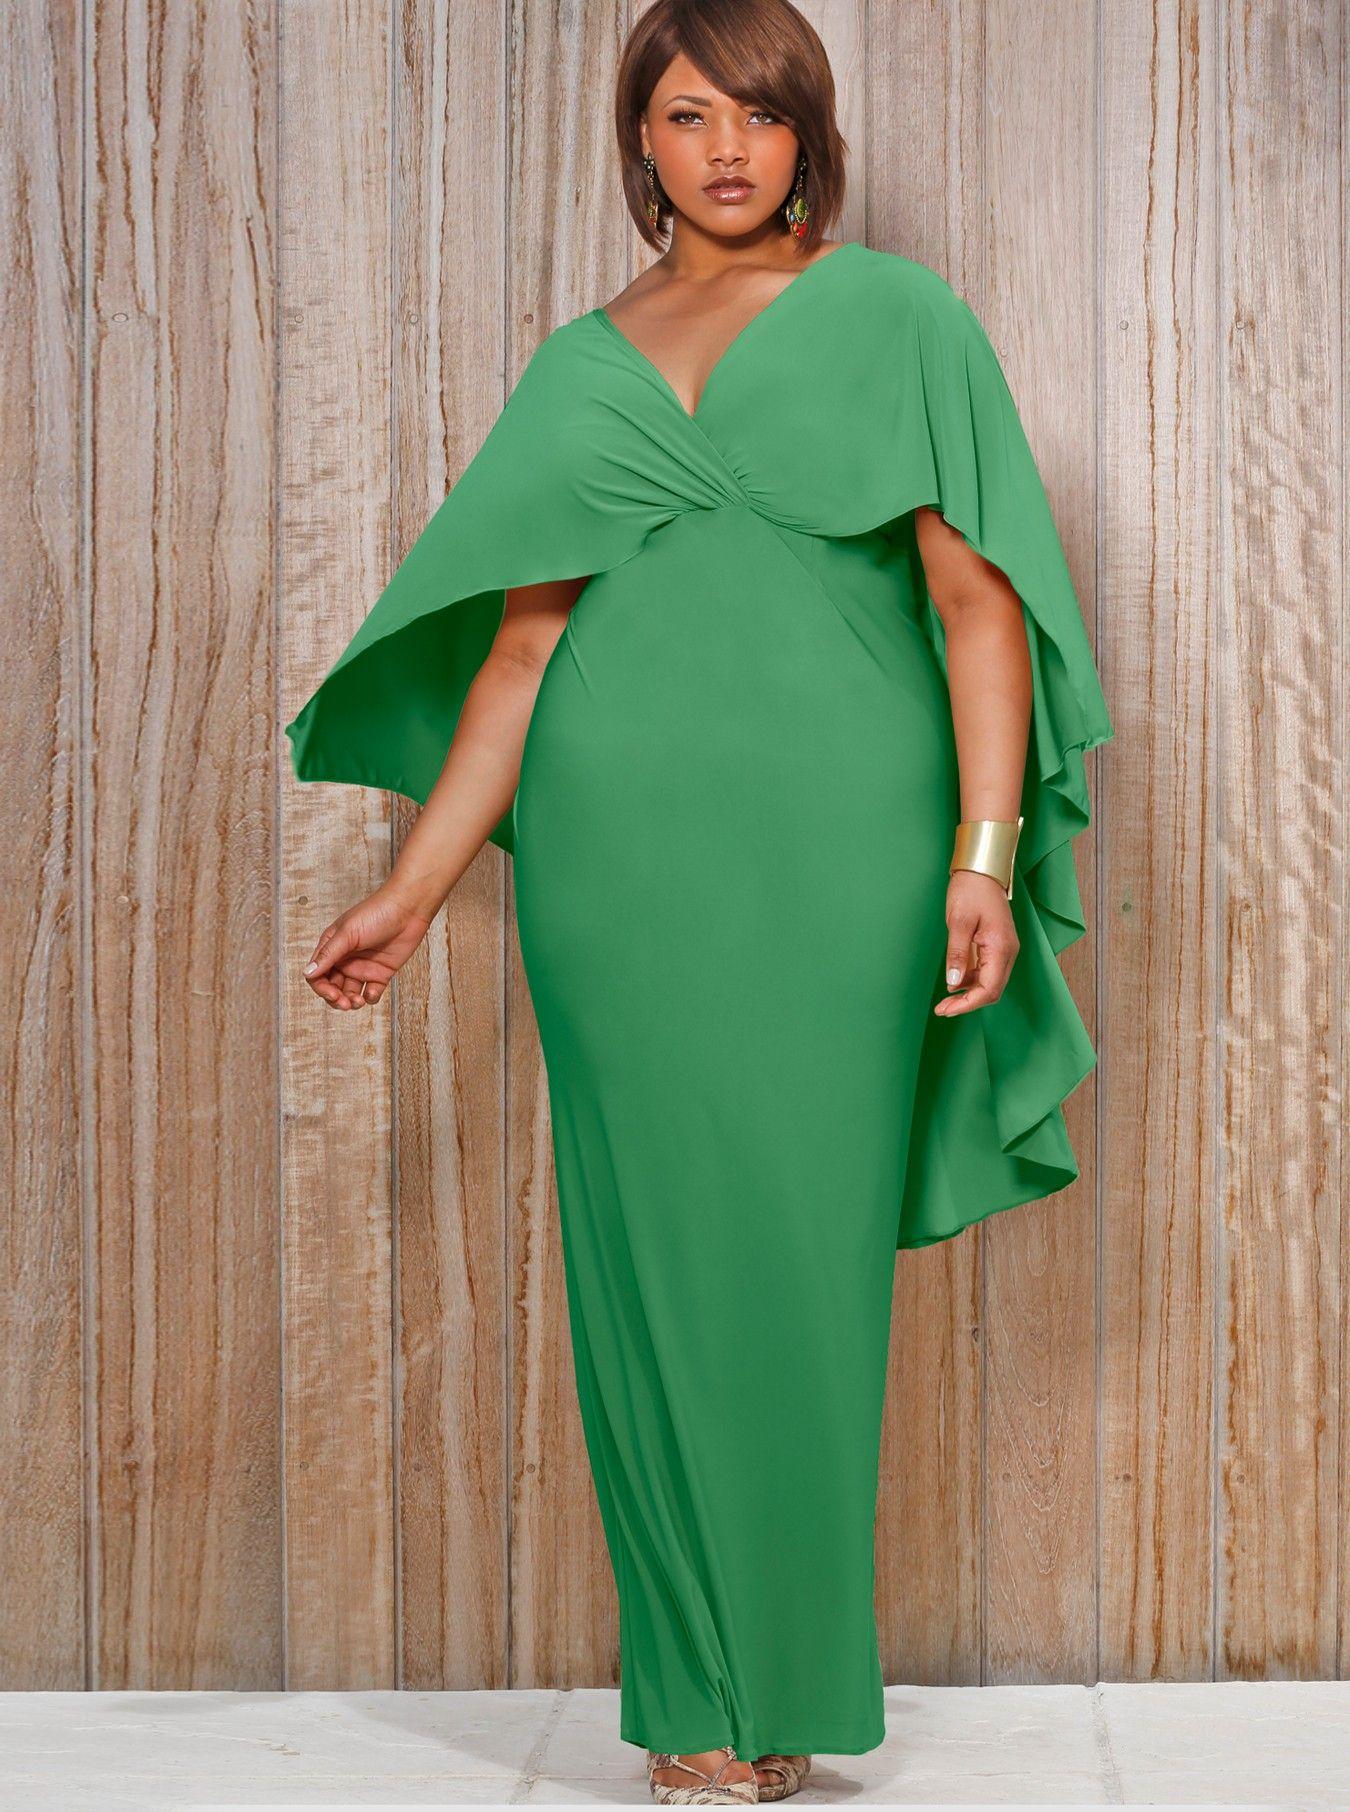 A beautiful plus size dress. I am admiring the drape and ...